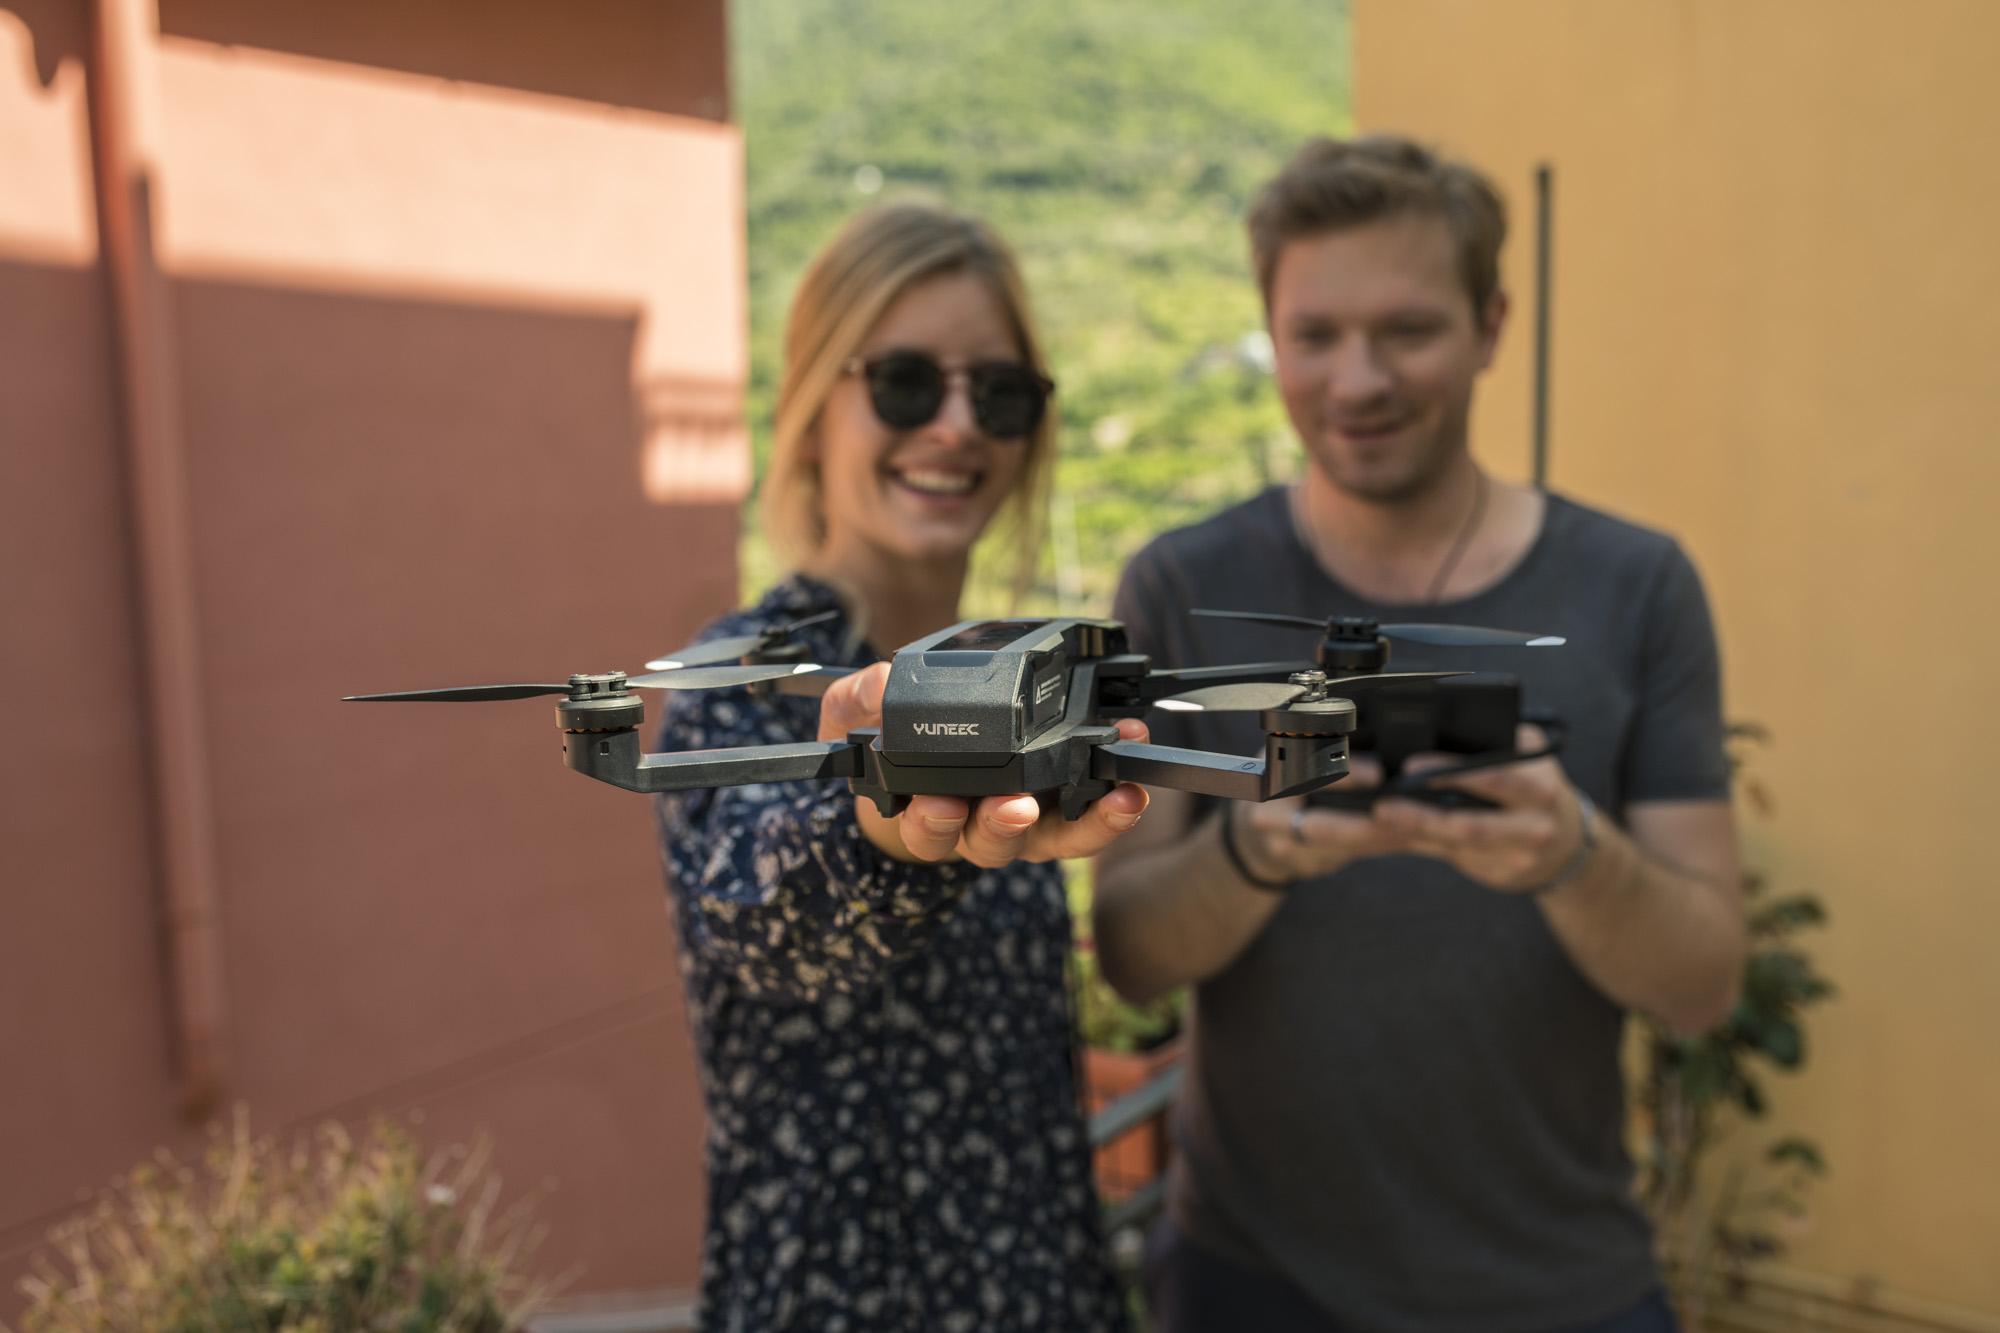 Yuneec Mantis Q drone